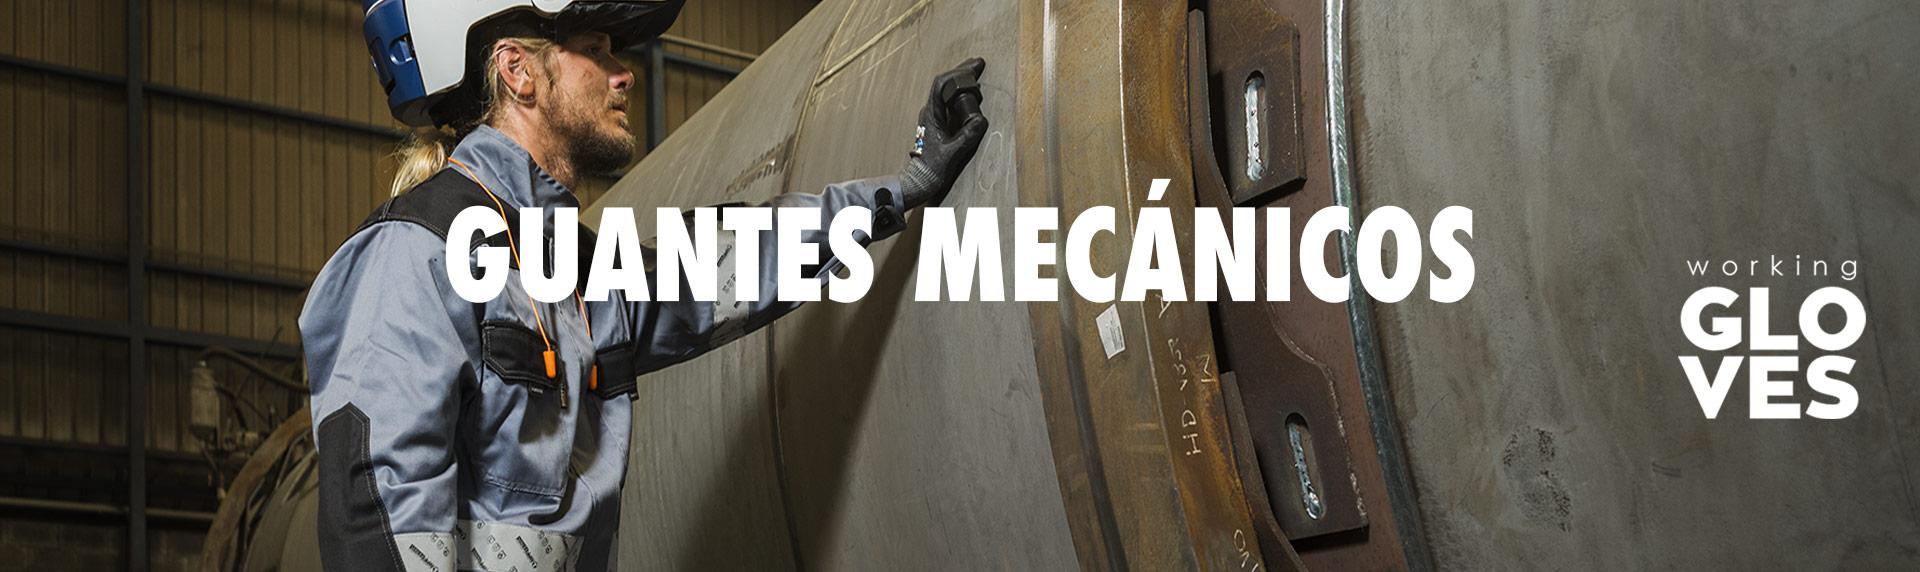 GUANTES MECÁNICOS